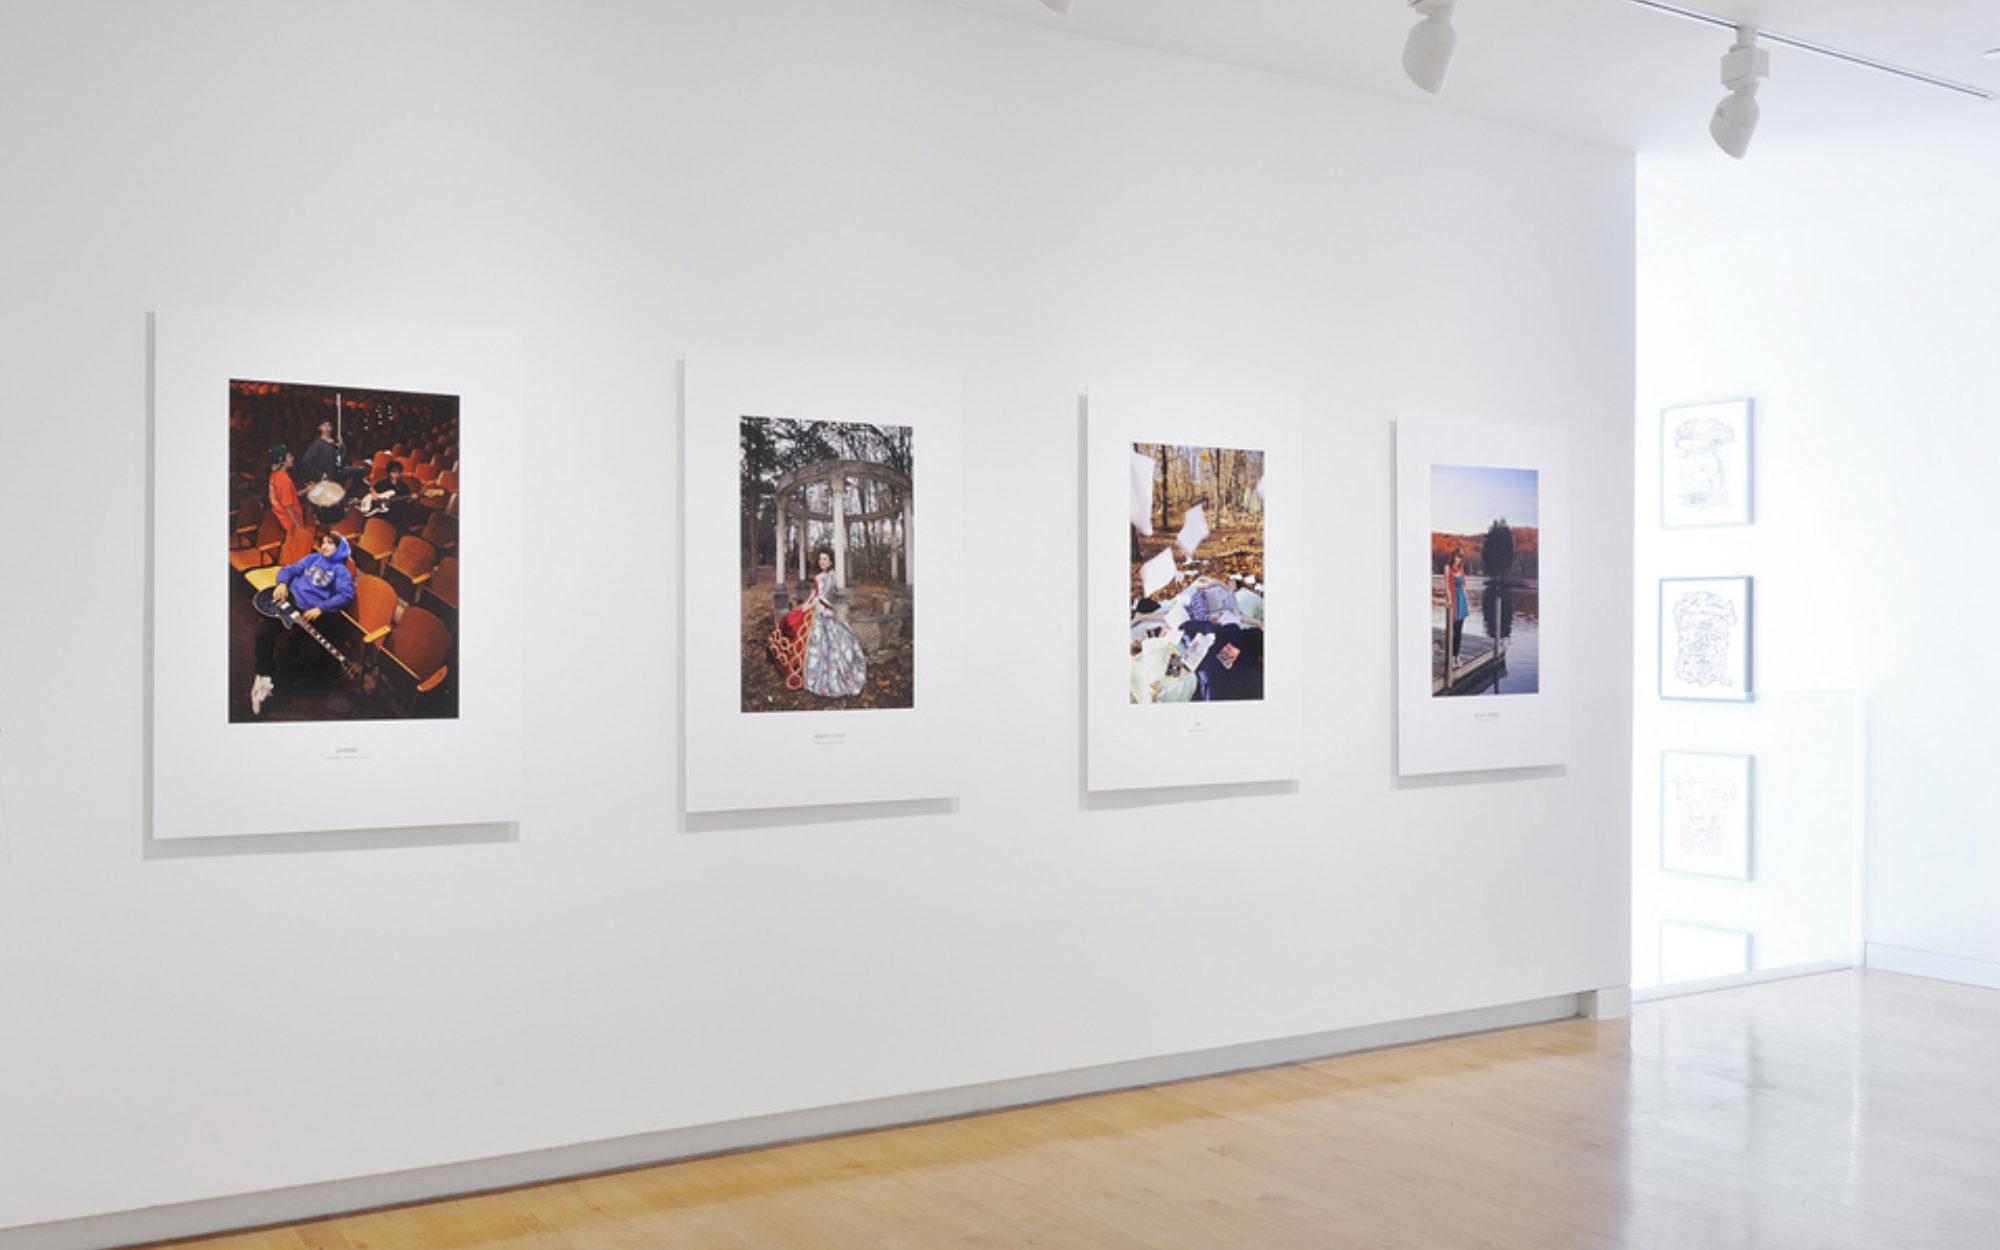 Thilo Hoffmann: High School Portraits